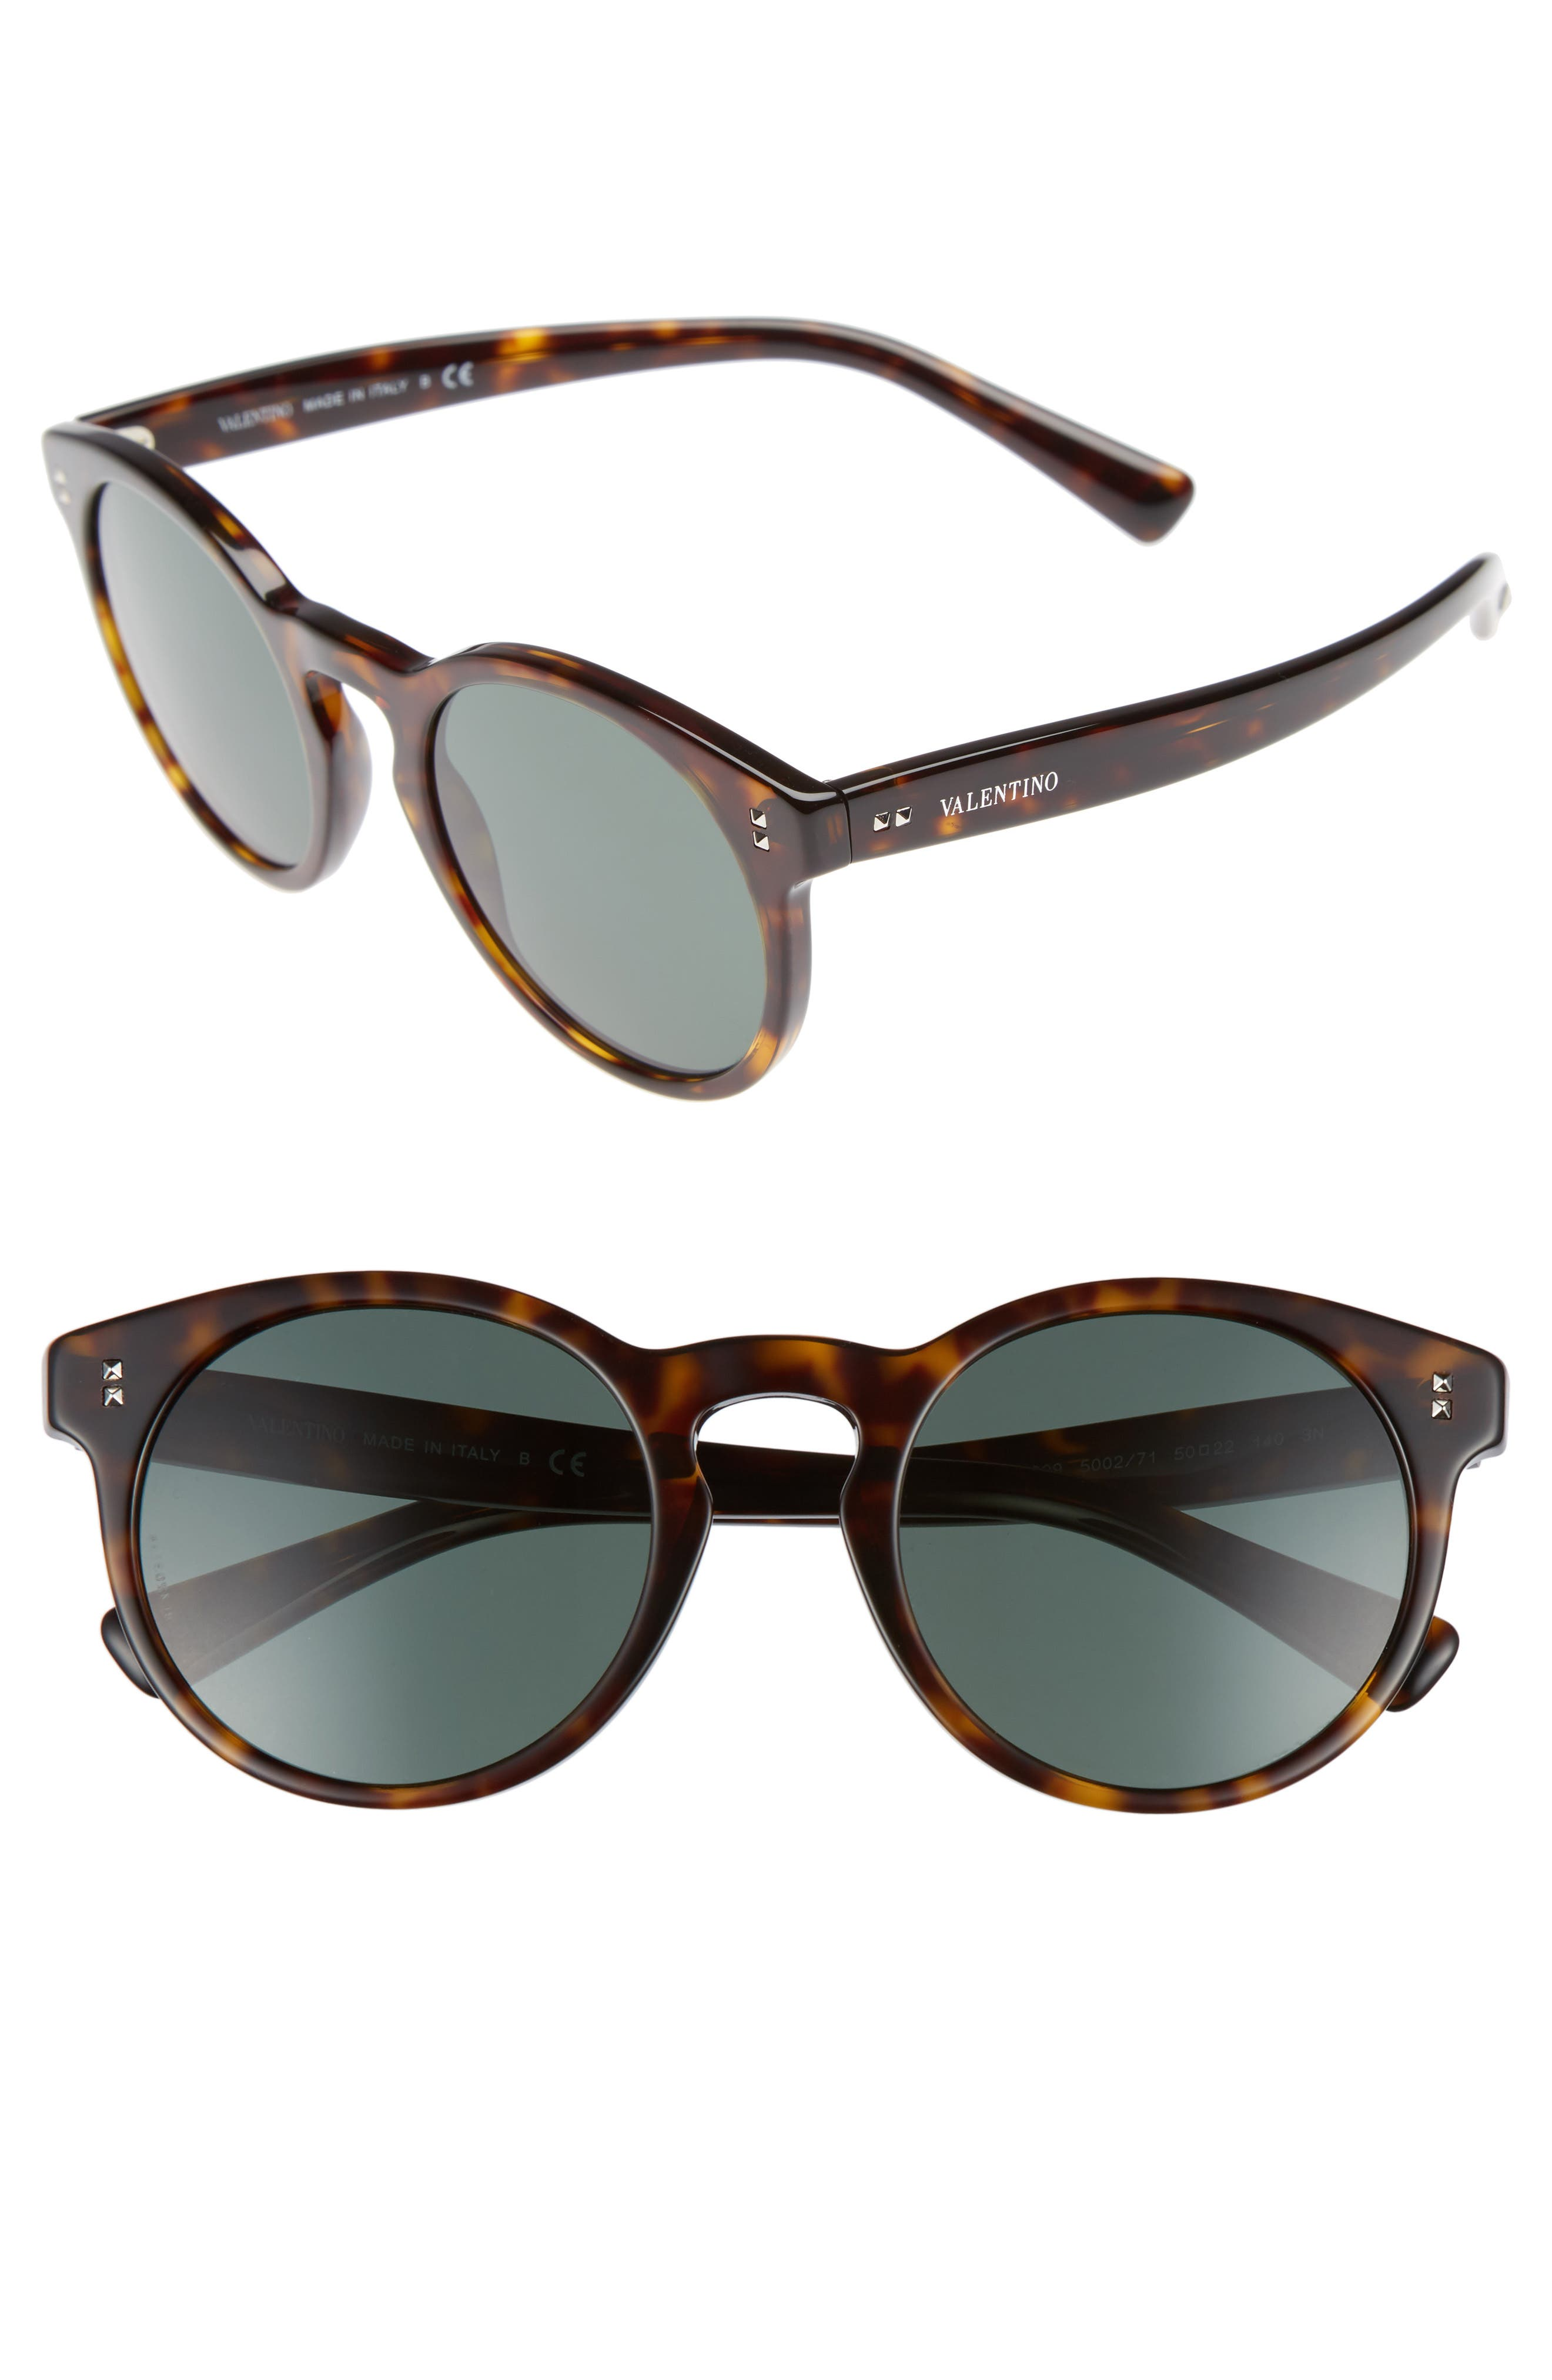 Valentino 50mm Retro Sunglasses